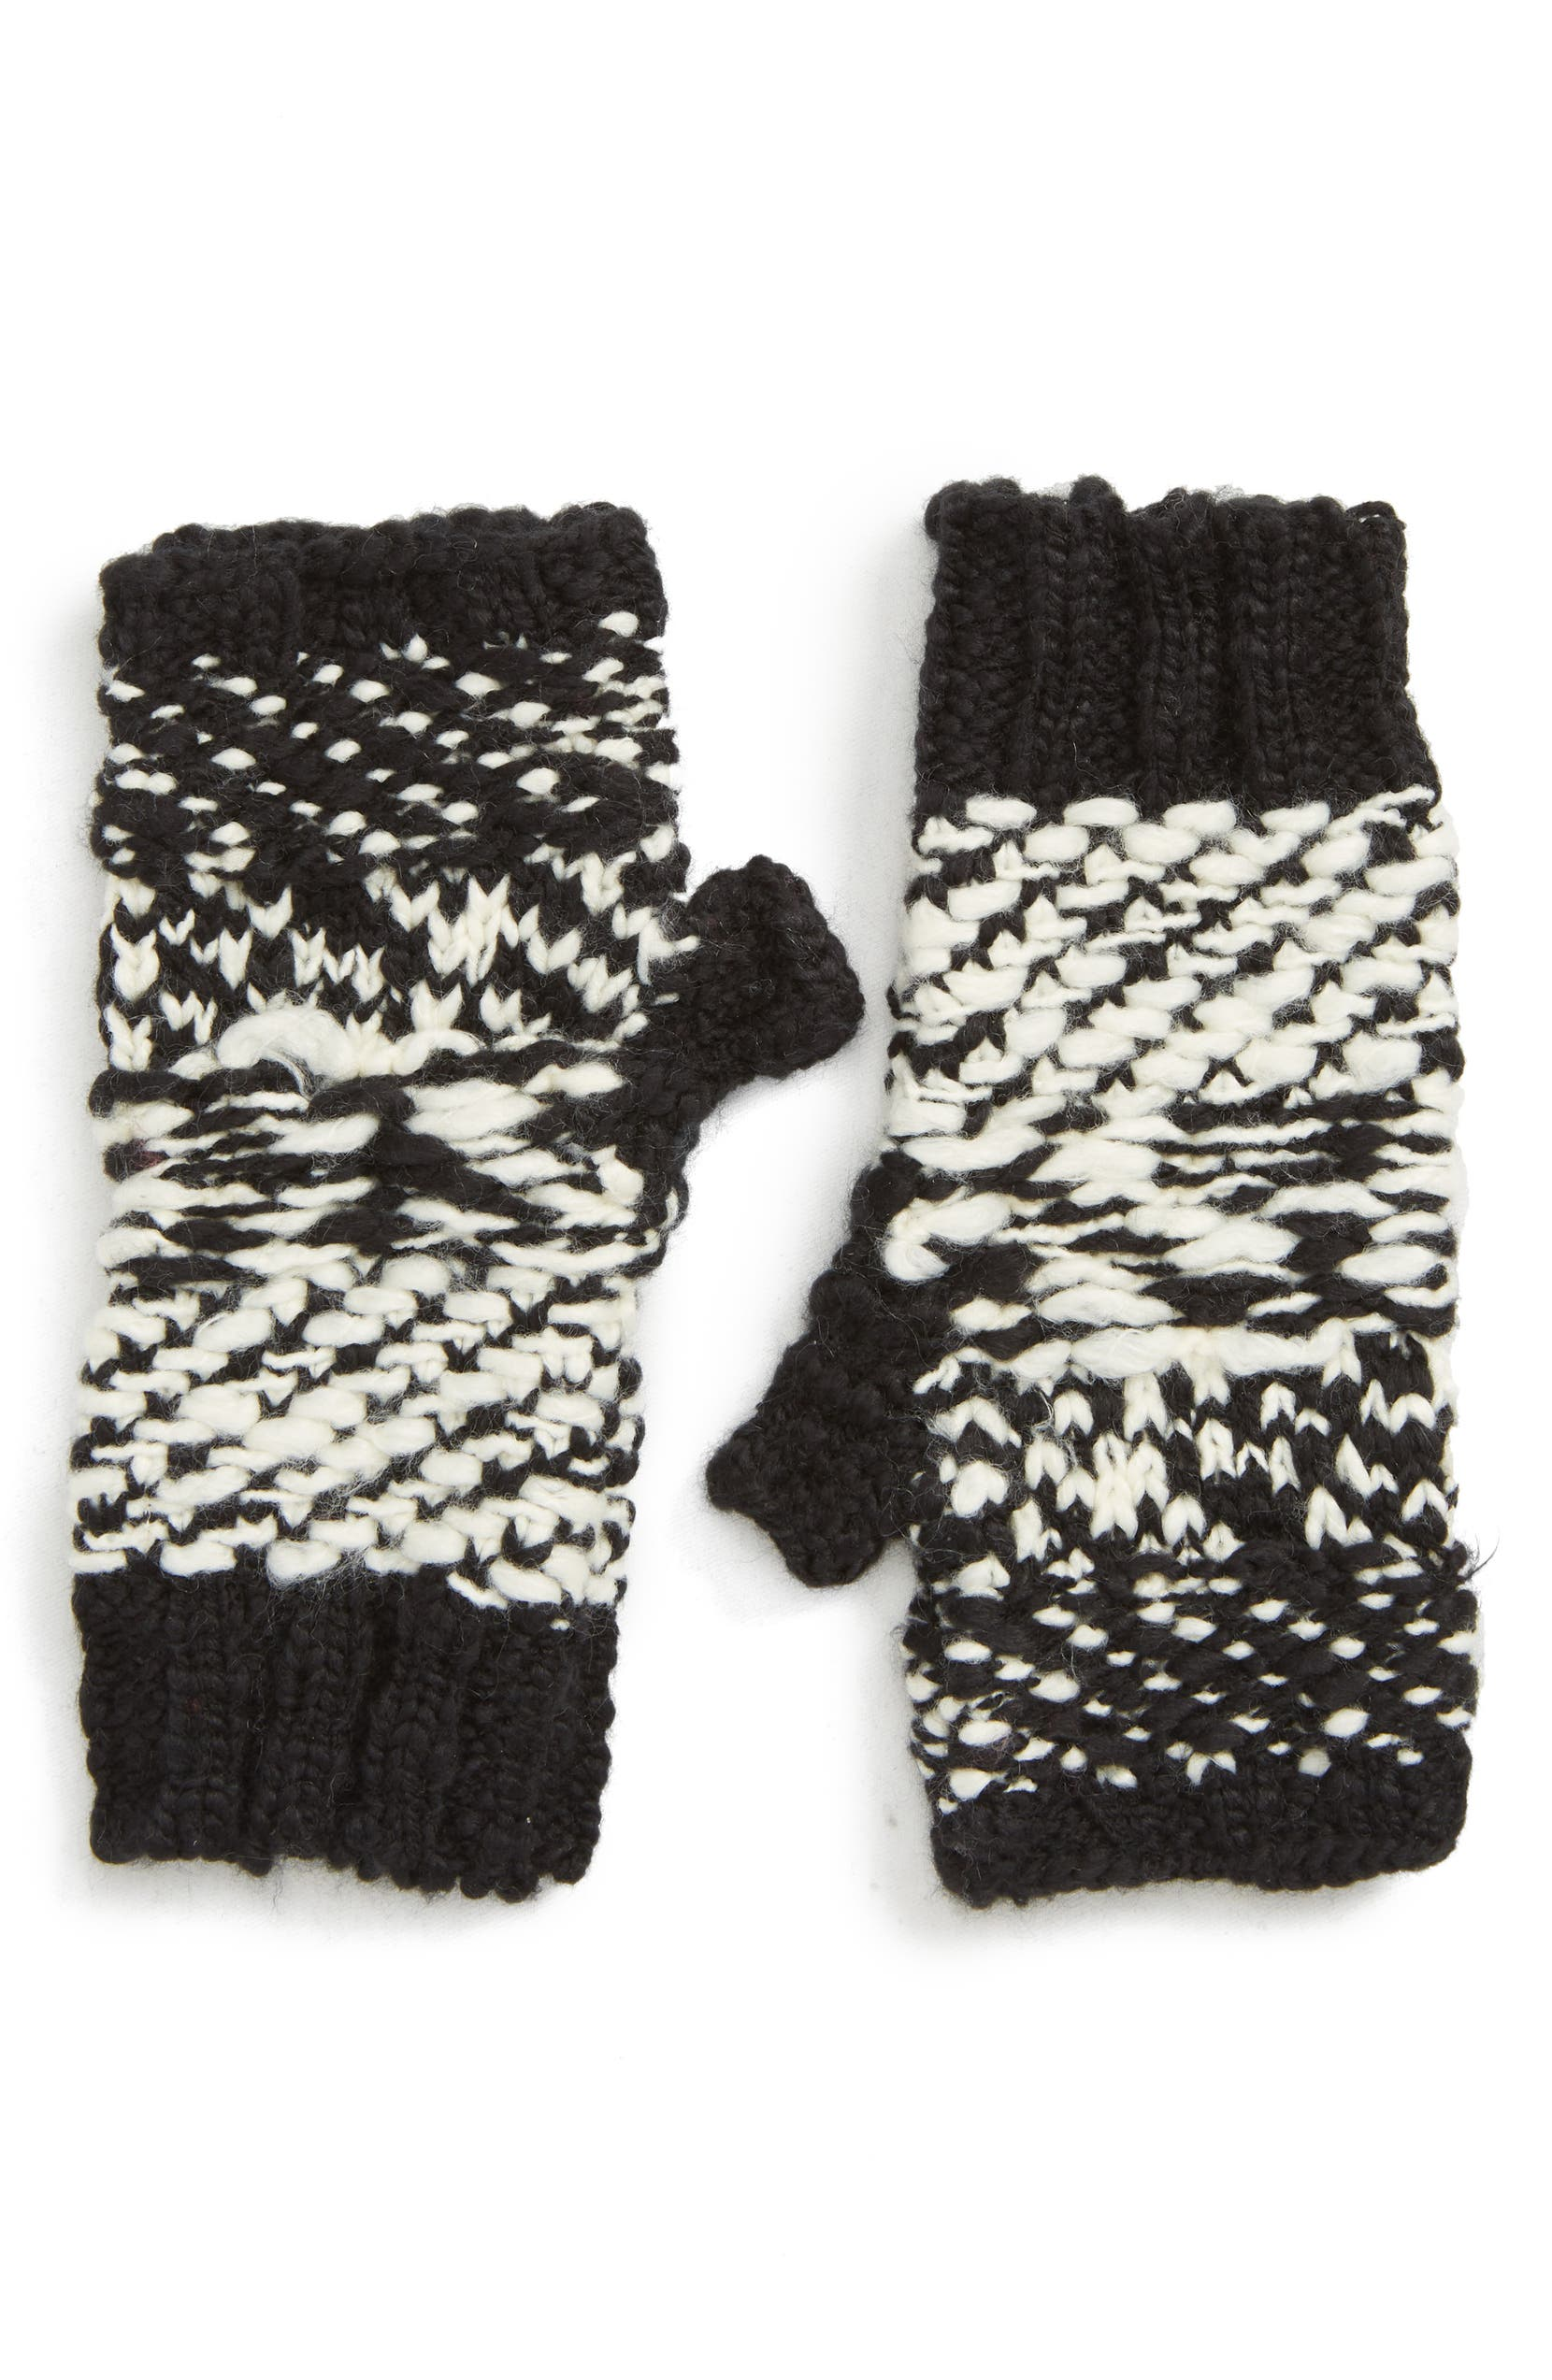 Free People Keep Cozy Knit Fingerless Gloves | Nordstrom